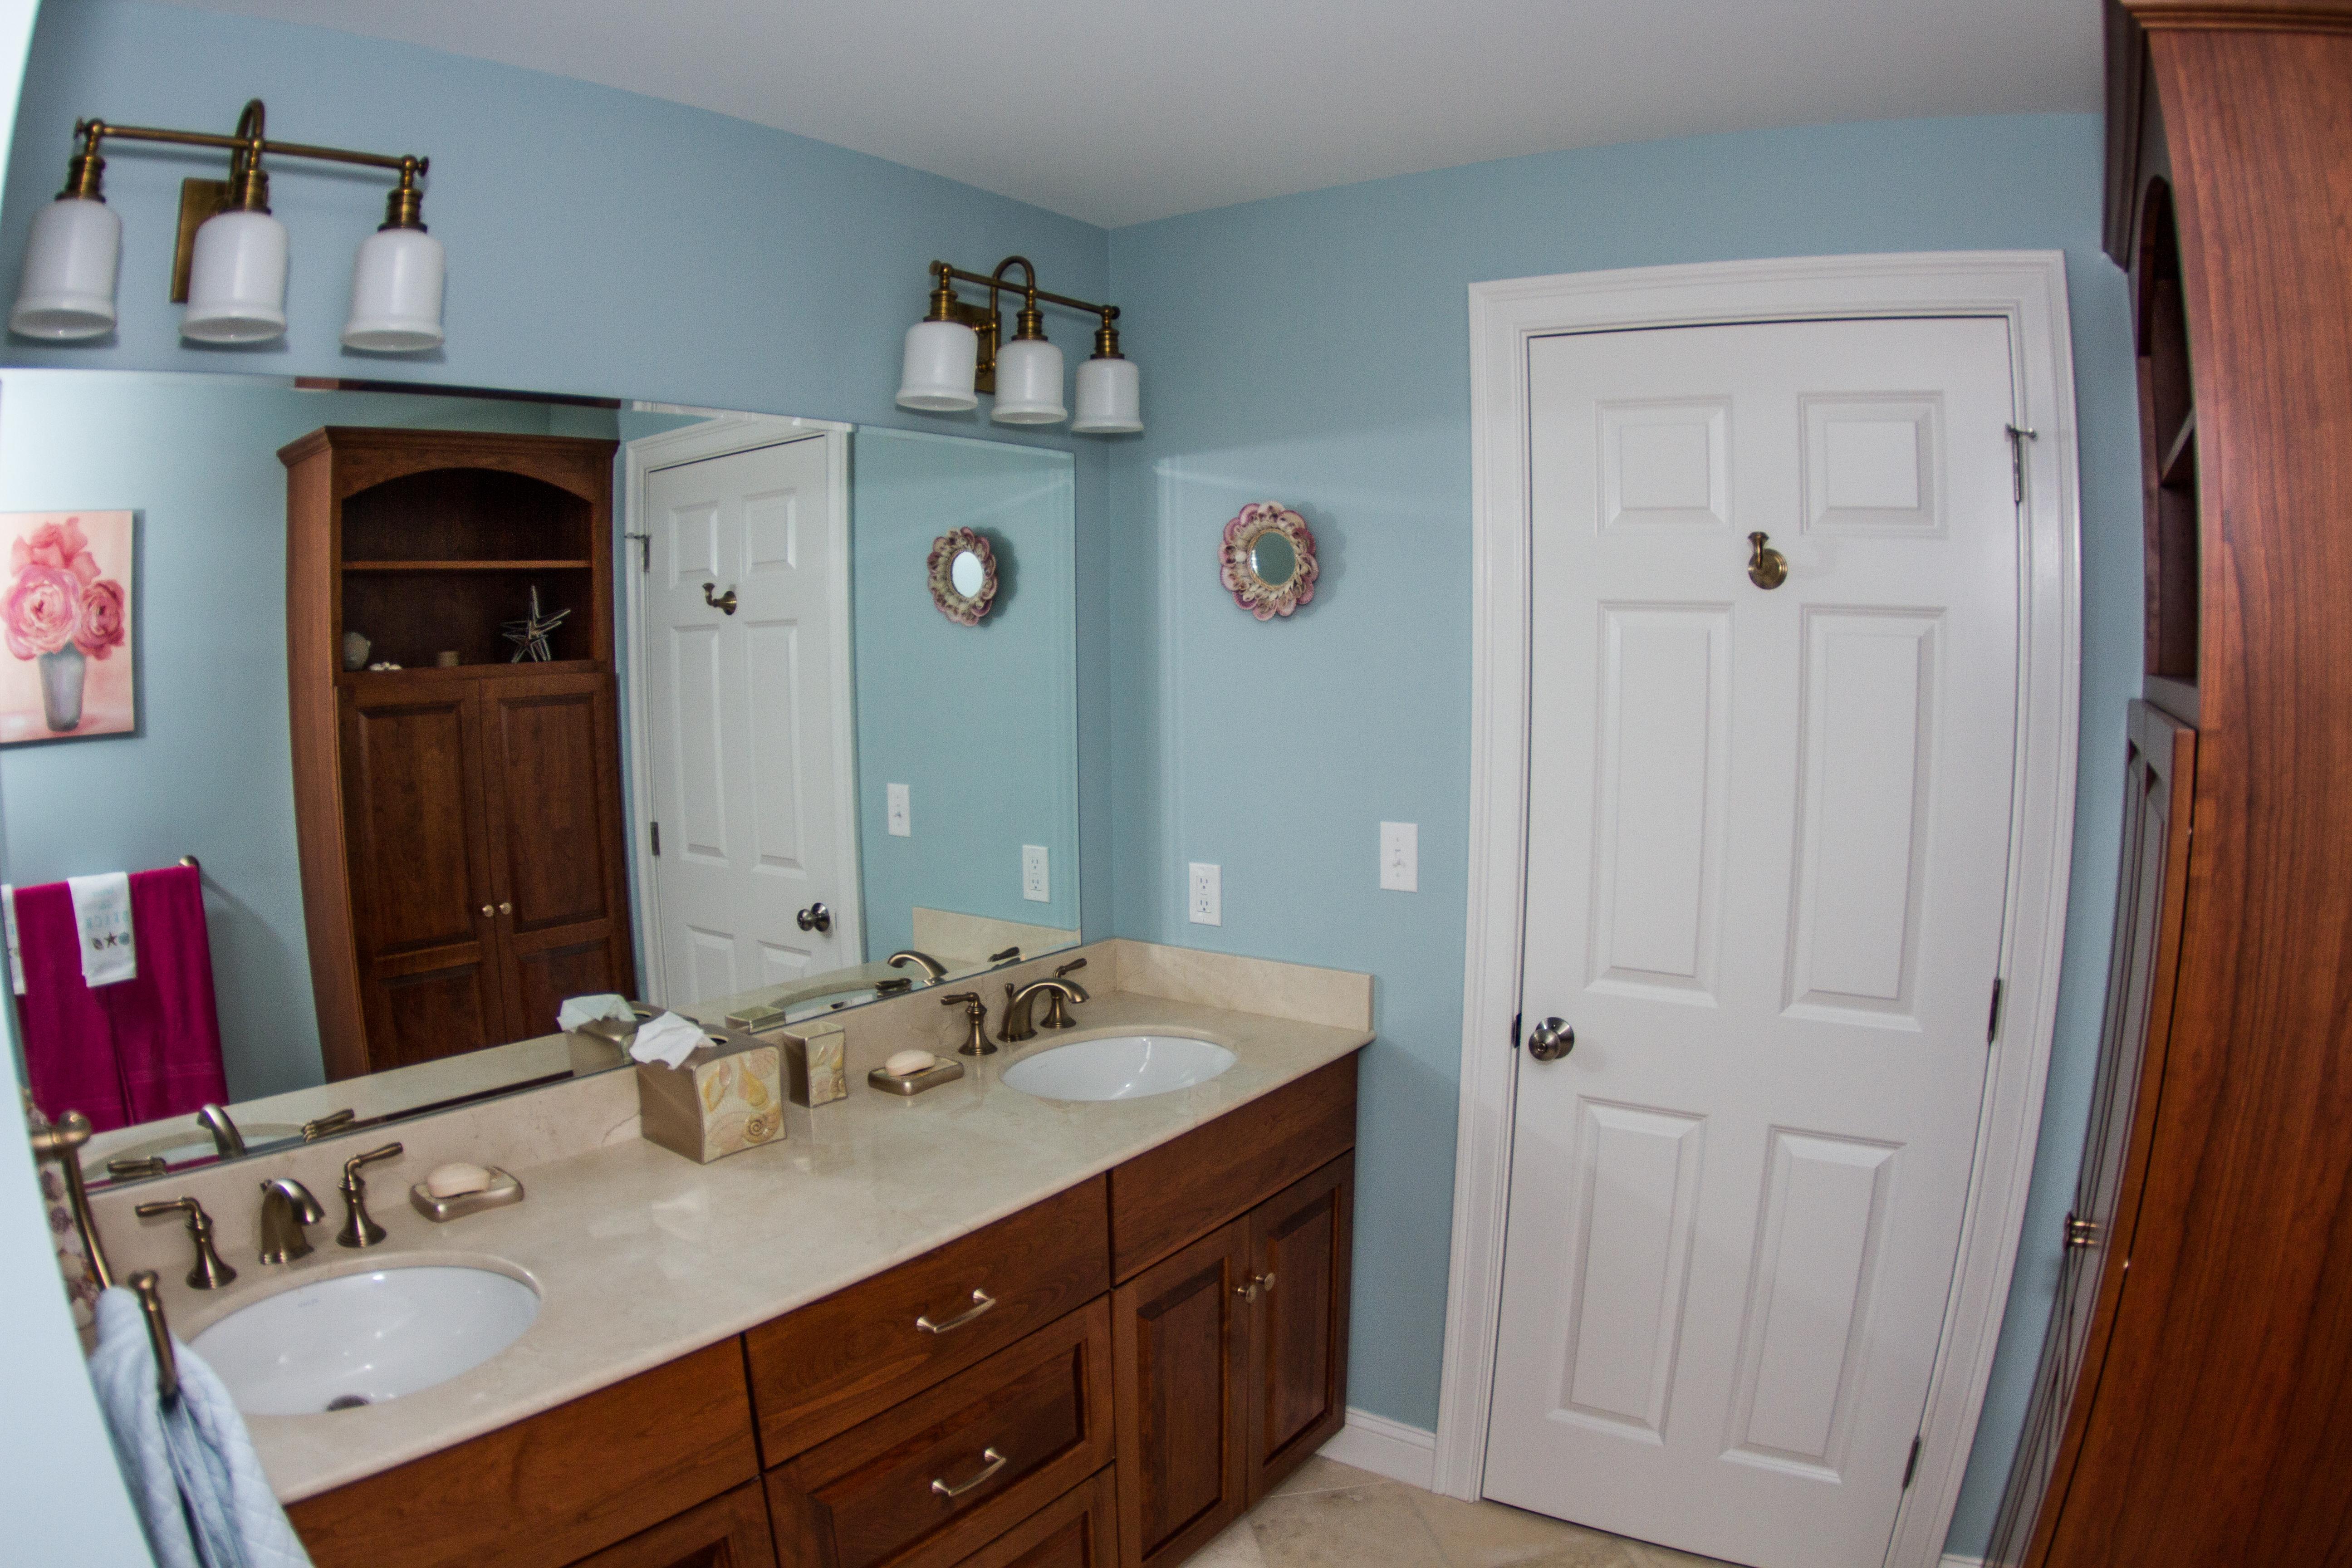 Bathroom Design and Renovations – Kennebunk Kitchens and Baths